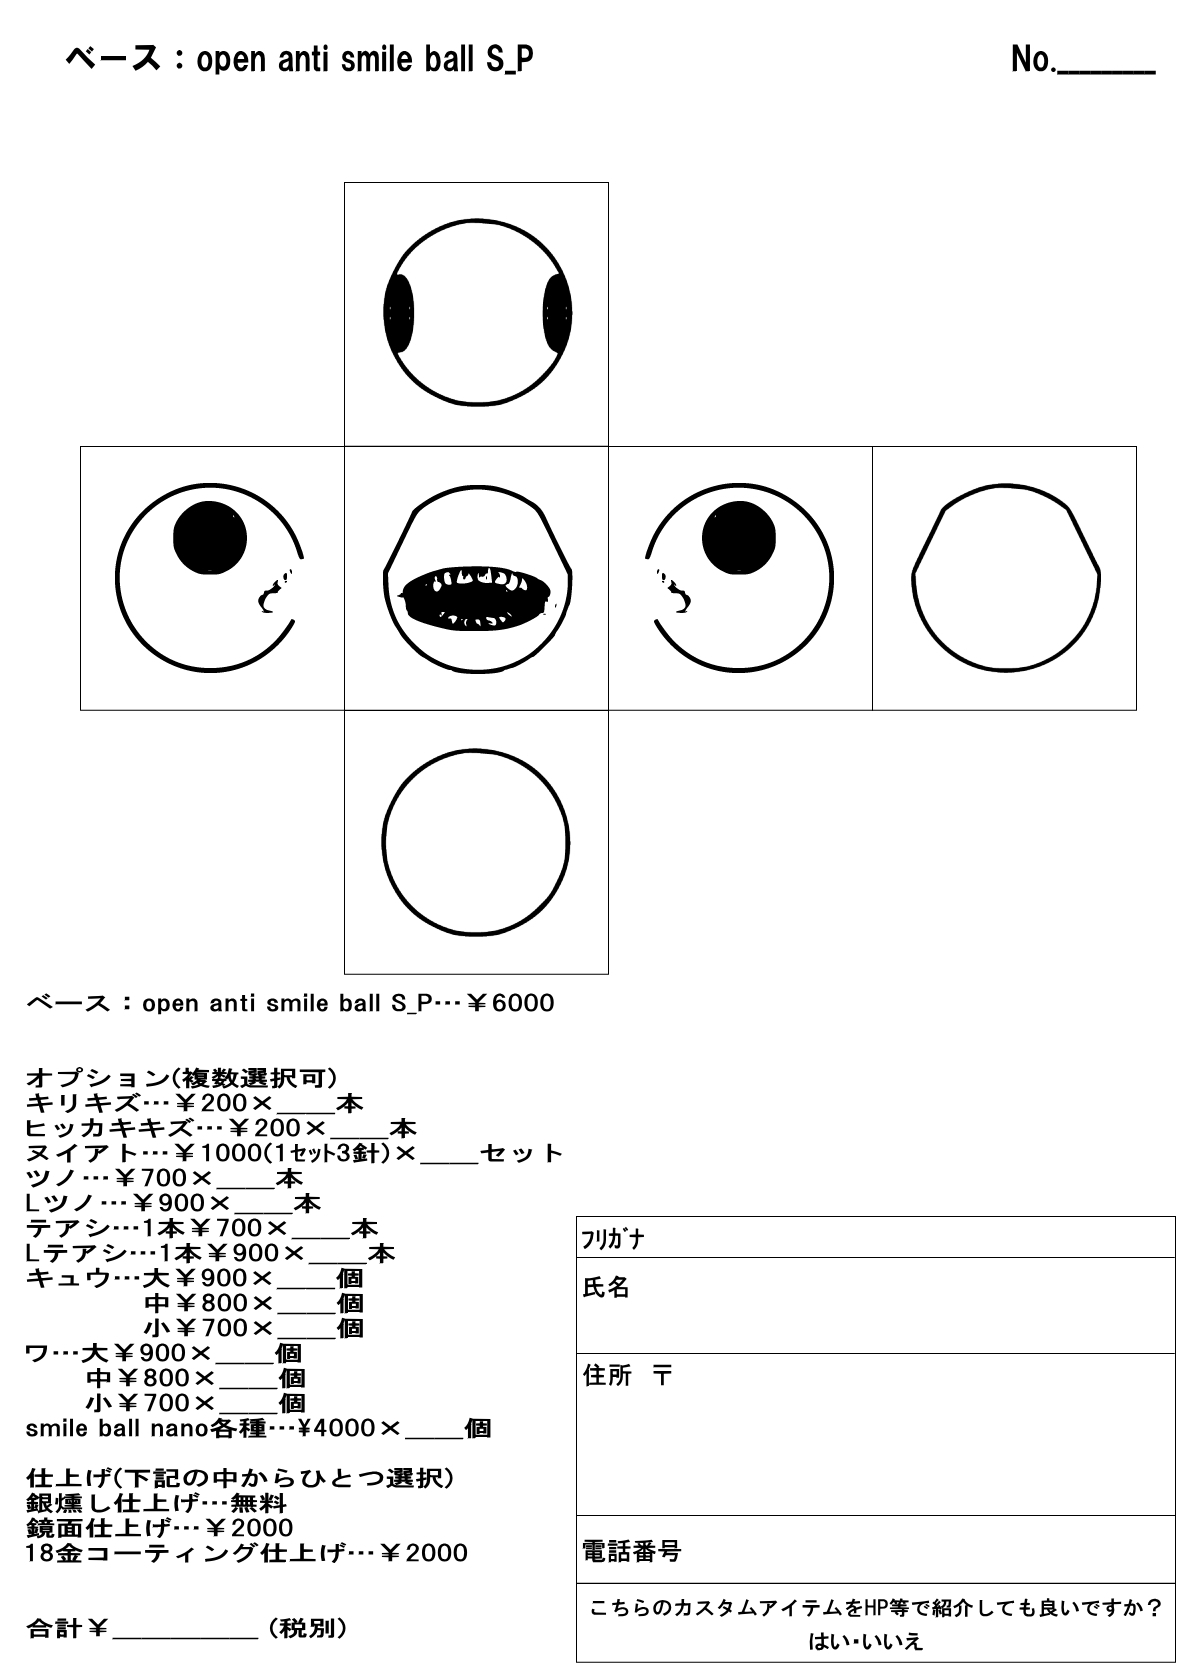 12/2smile_mammyカスタム受注イベント詳細。_d0014014_23140843.jpg